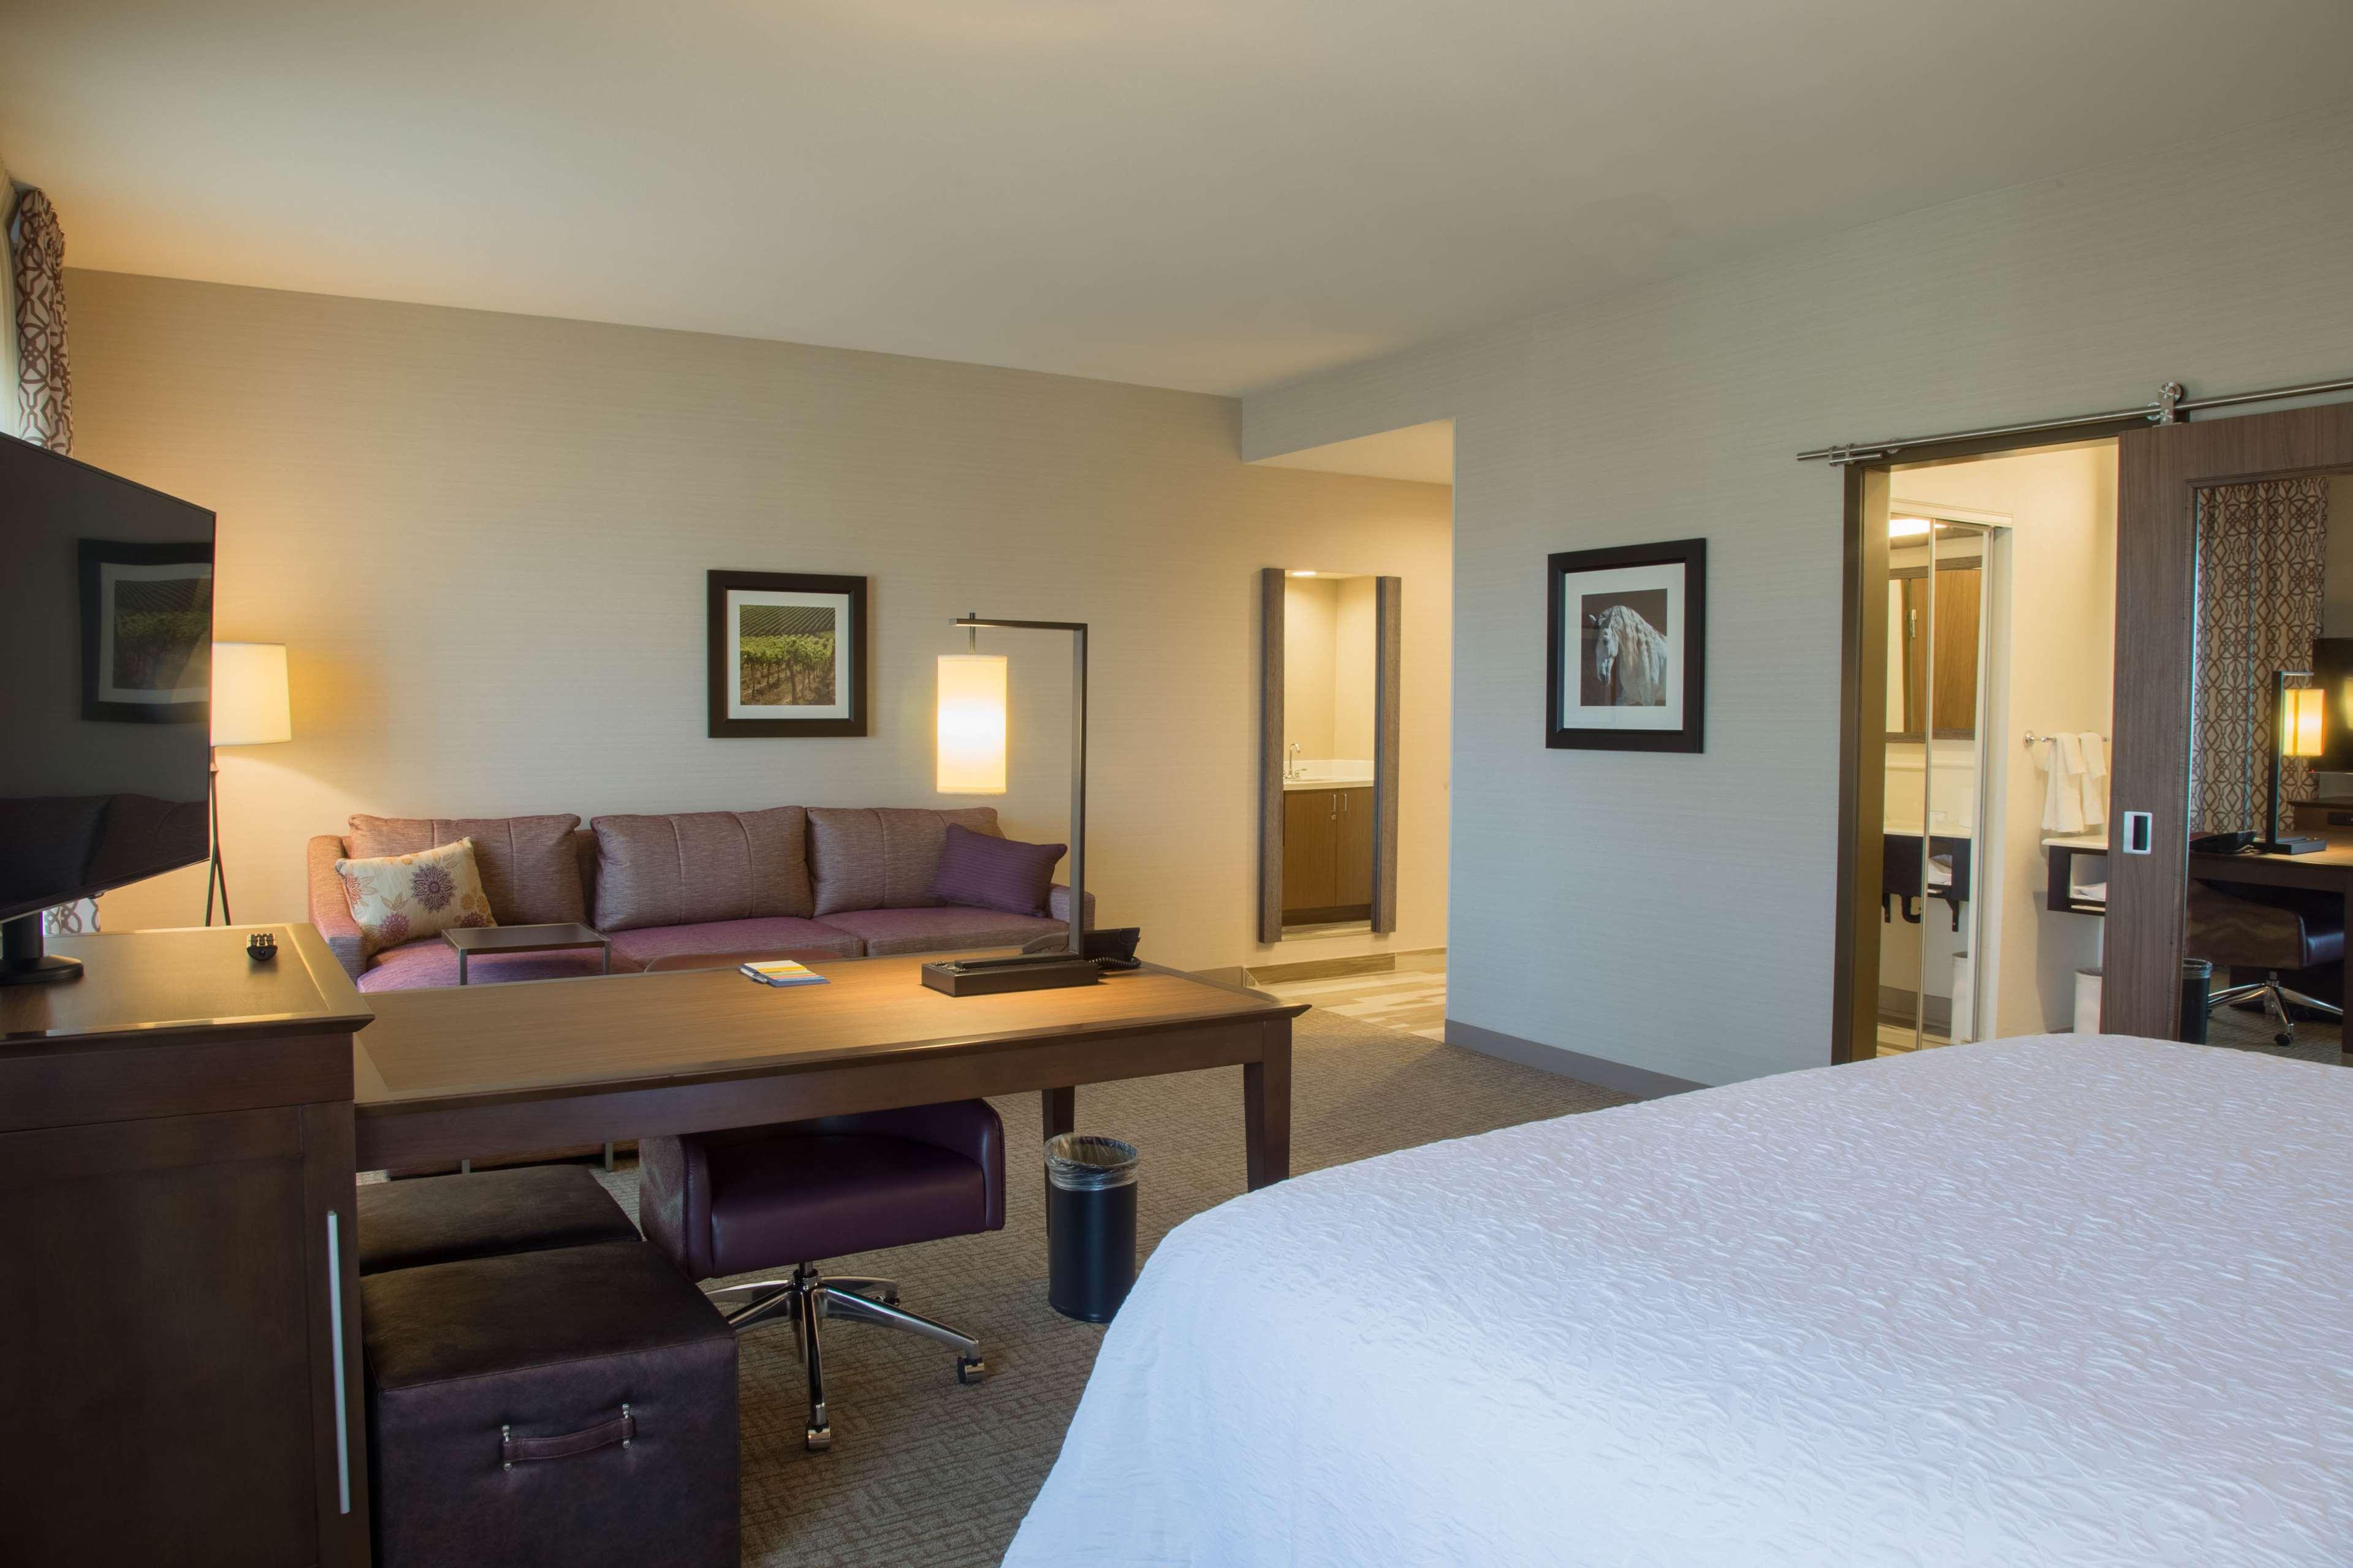 Hampton Inn & Suites Murrieta Temecula image 30